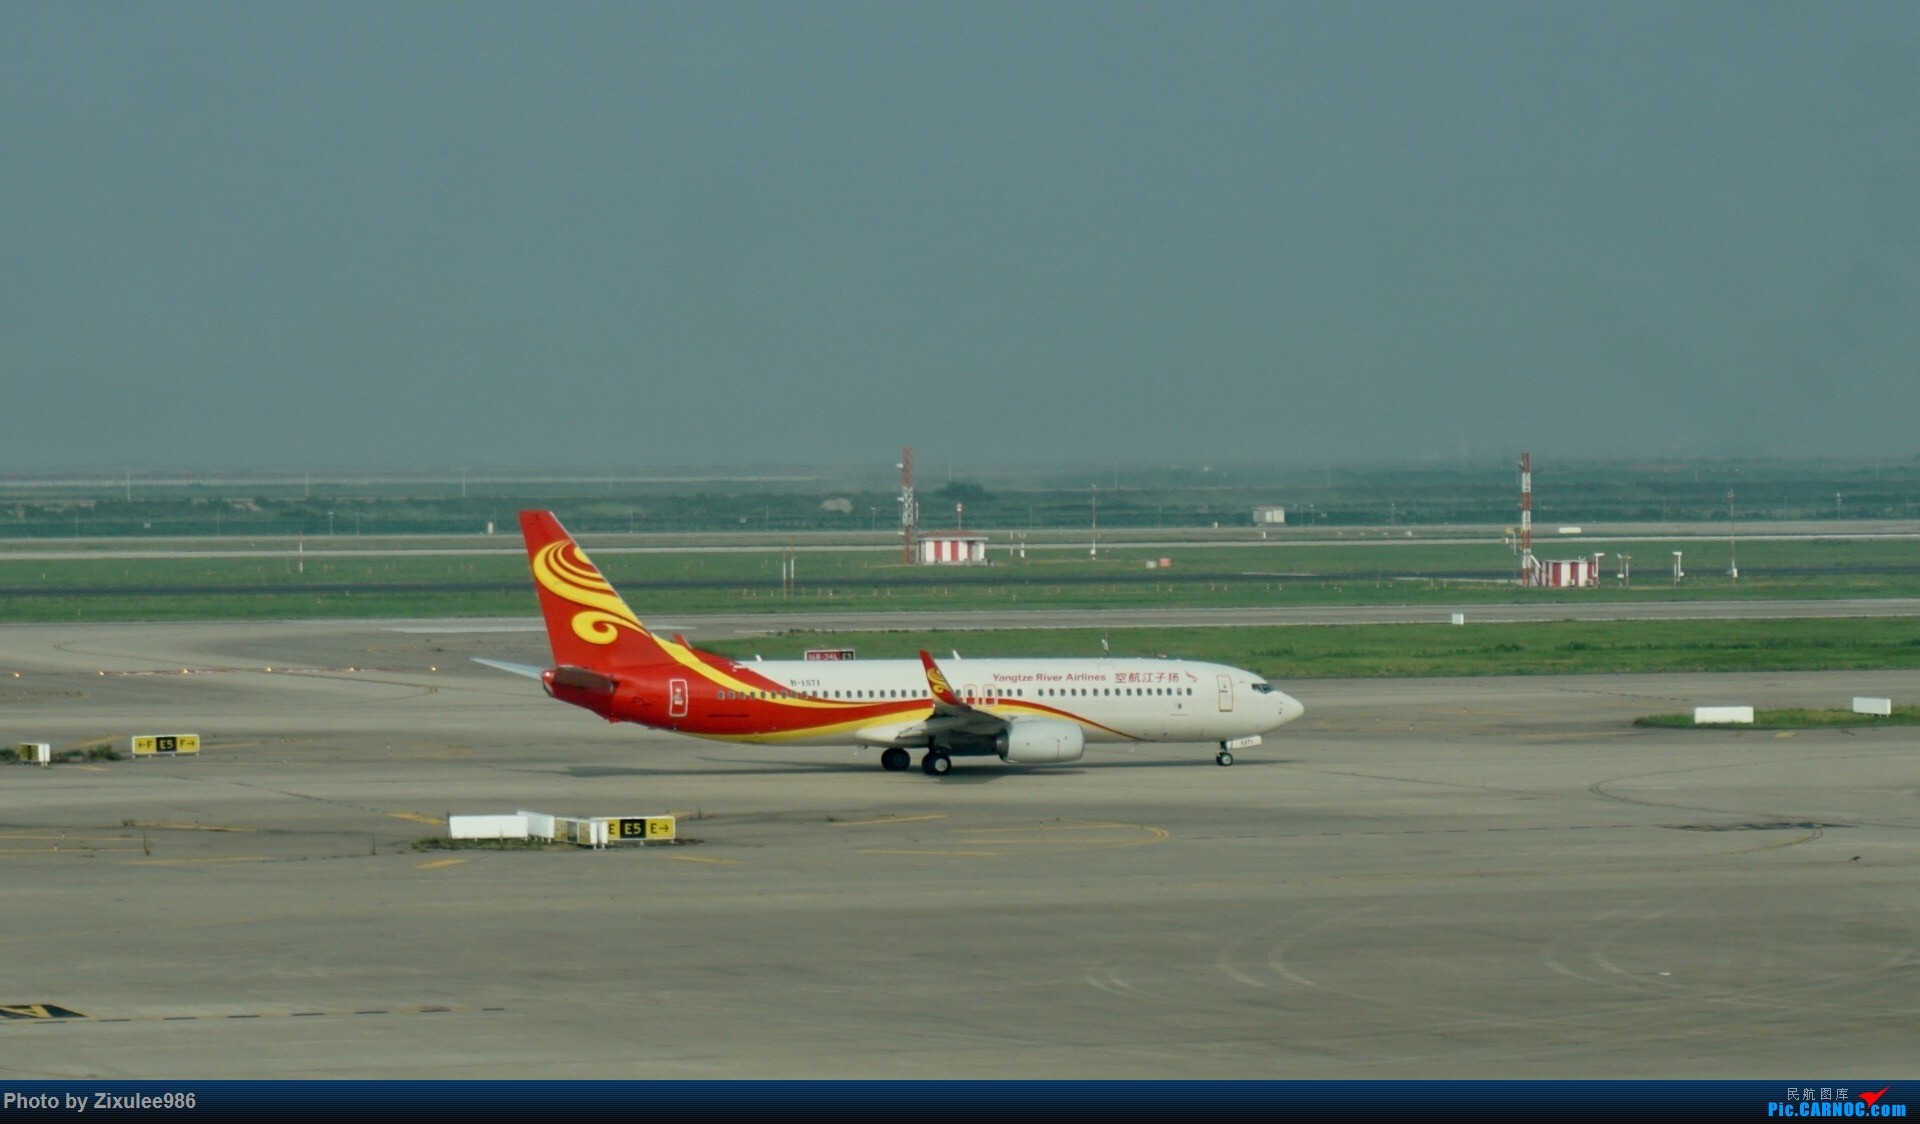 Re:[原创]加拿大21日游学之旅(一)~JJN-PVG-YYZ..(内含flightlog)~第一次发游记~多图缓更请谅解 BOEING 737-800 B-1571 中国上海浦东国际机场